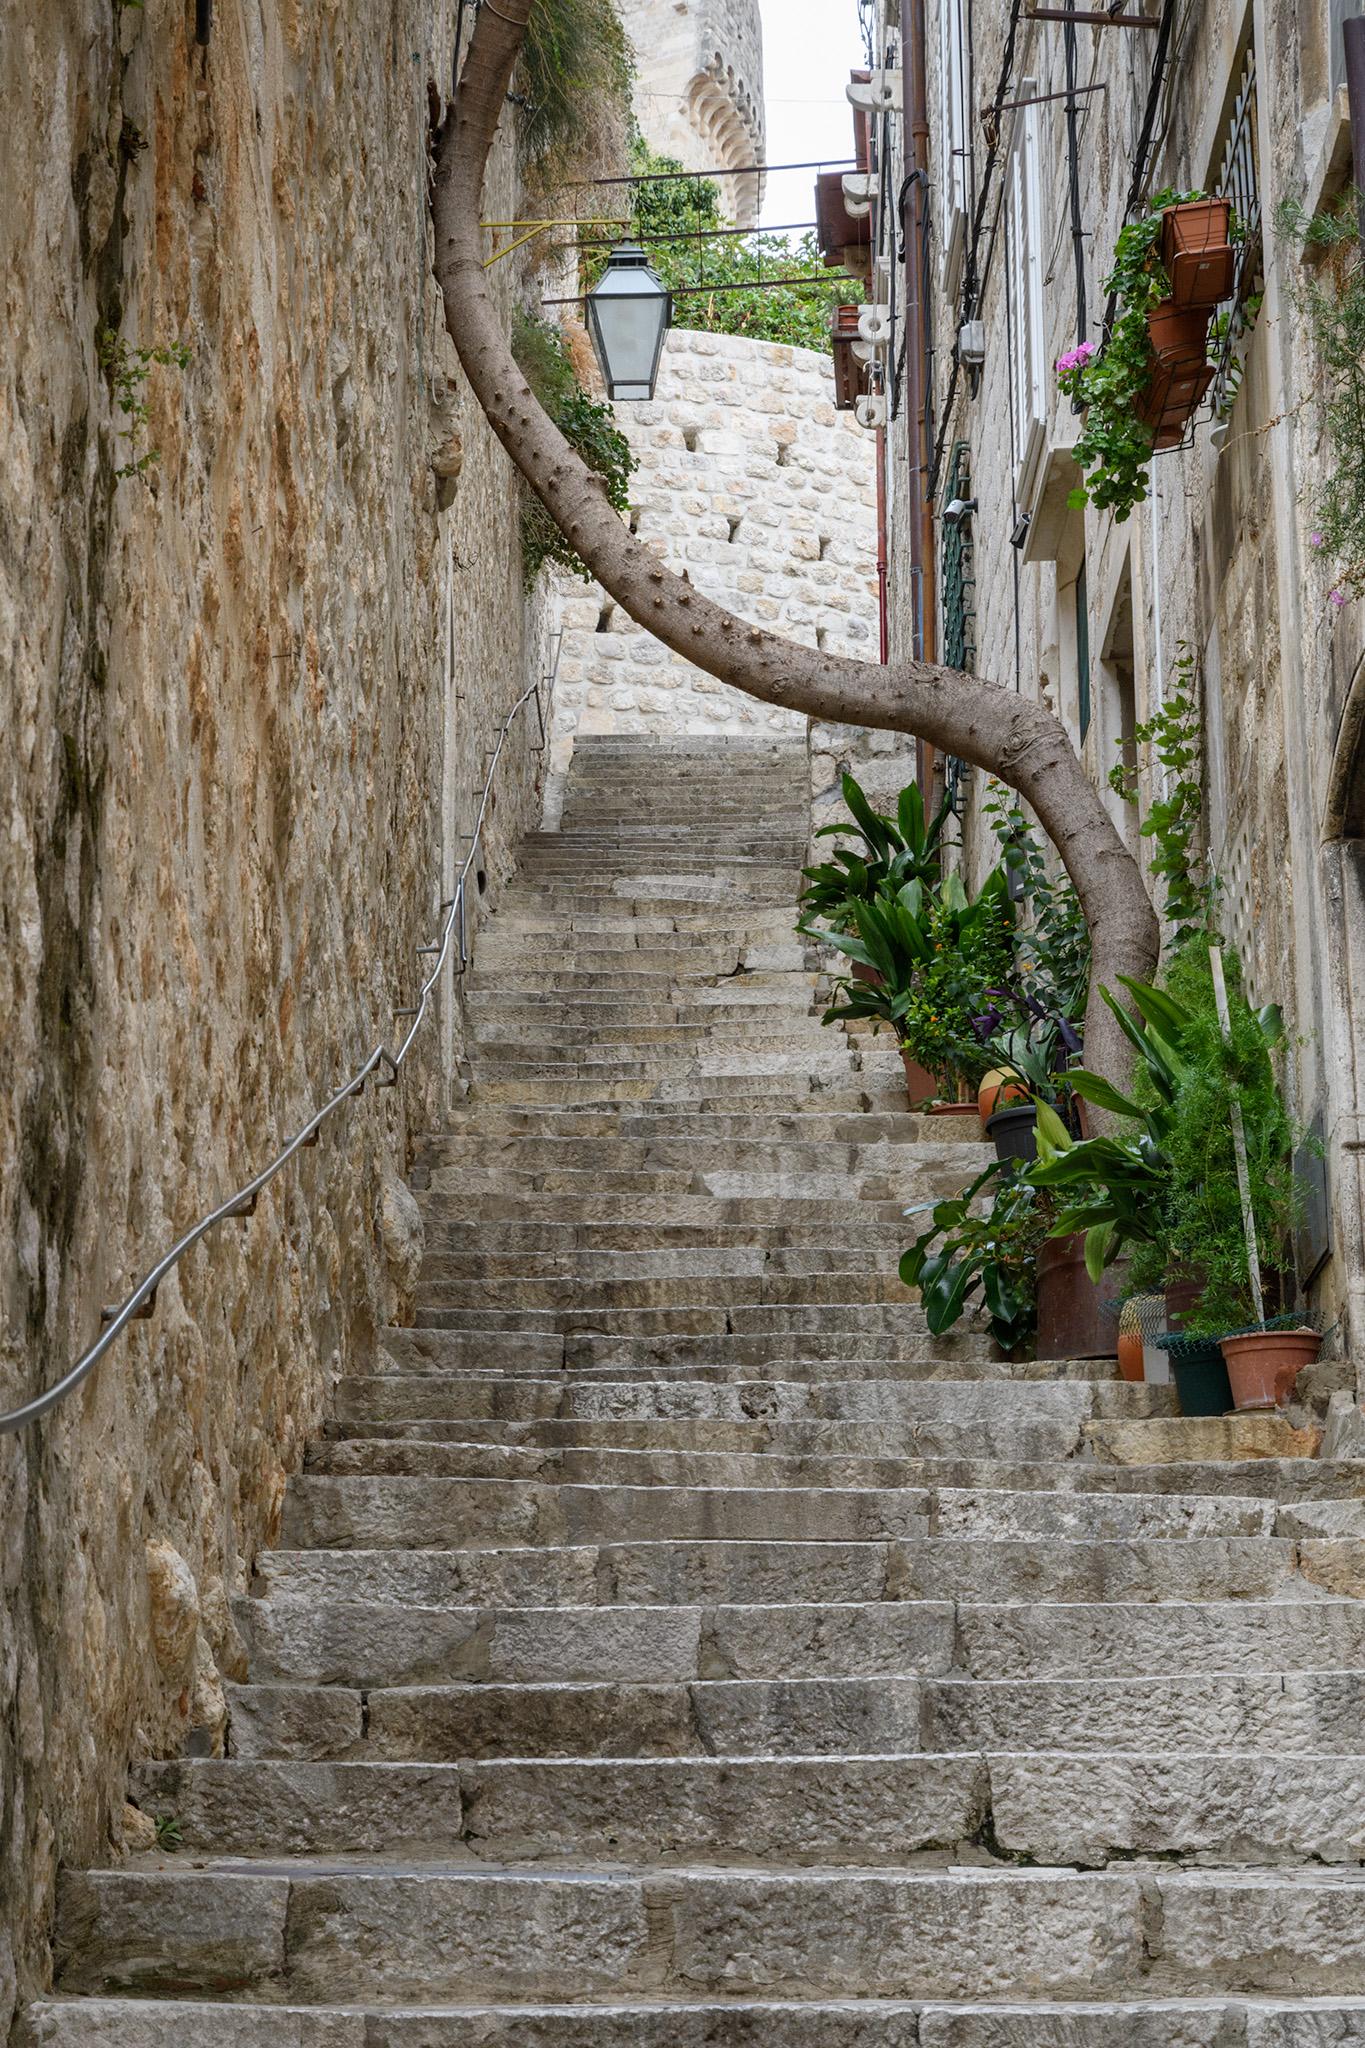 20171007 - Dubrovnik - 142.jpg